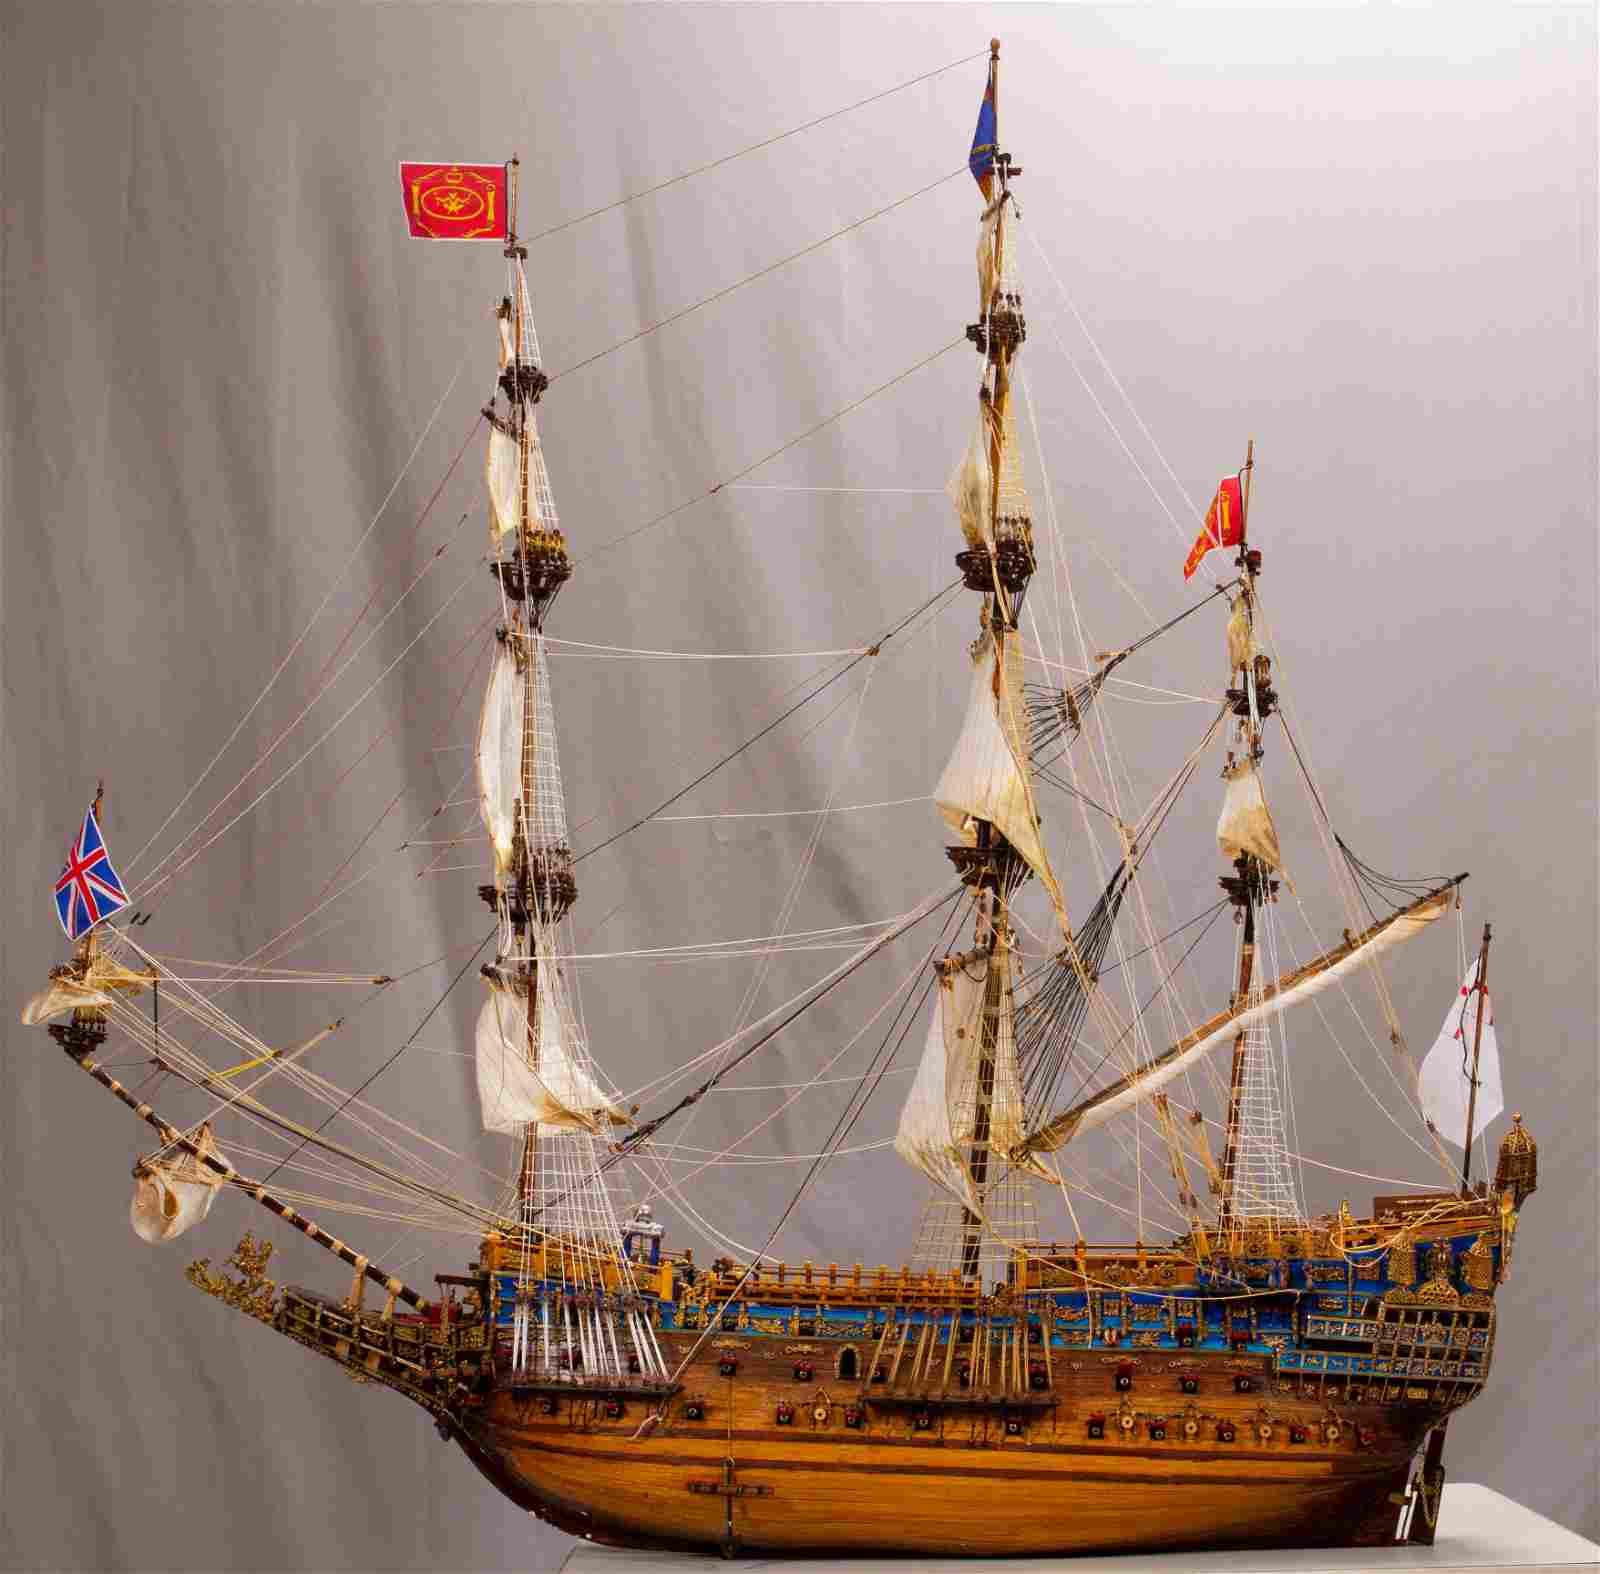 "4-MASTED SHIP MODEL, H 40"", W 12.5"", L 48"""